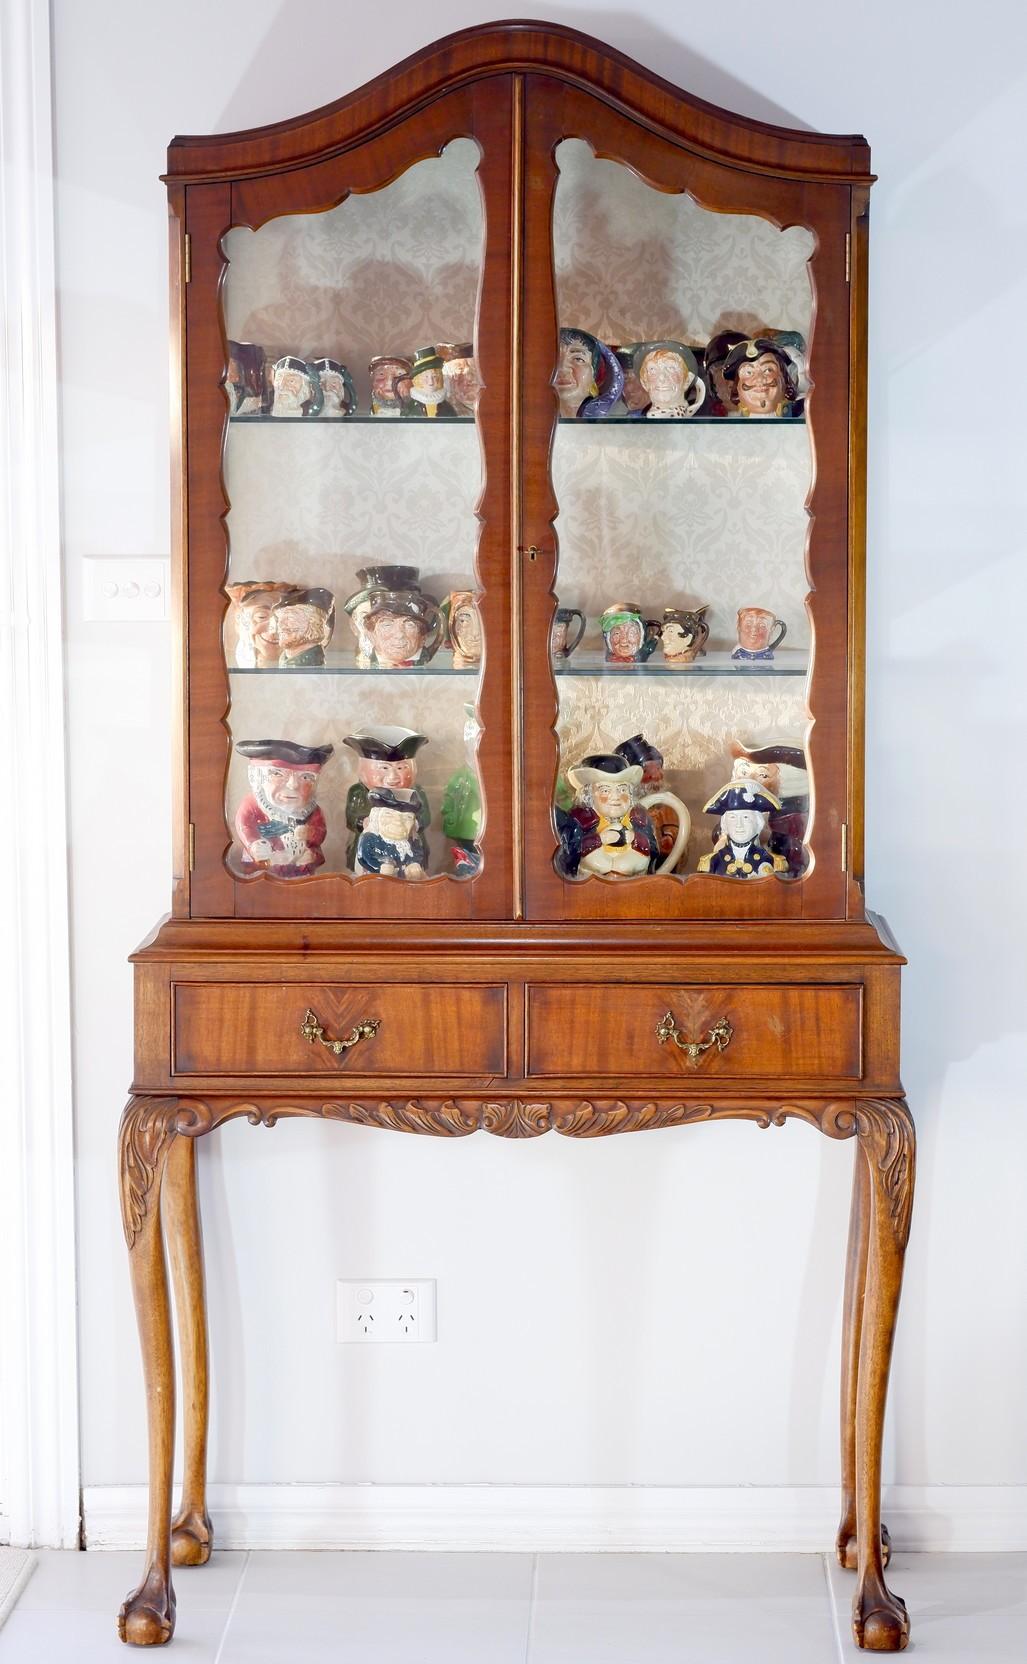 'Vintage Carved Maple and Mahogany Veneer Display Cabinet'